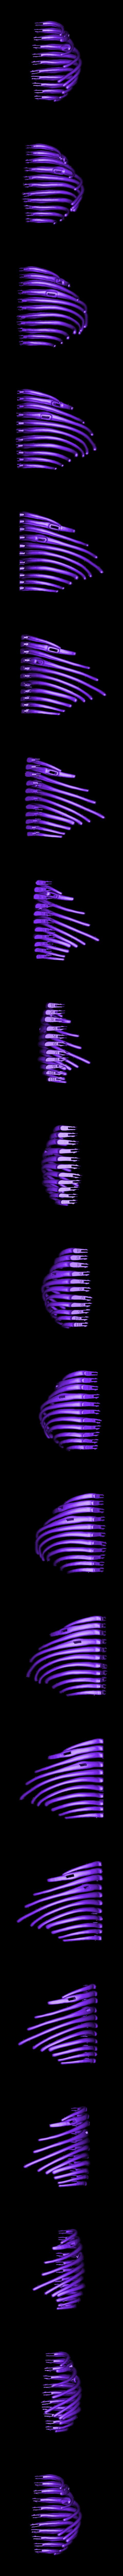 TRex_Ribs_Left.stl Download free STL file T-Rex Skeleton - Leo Burton Mount • 3D printing design, HarryHistory